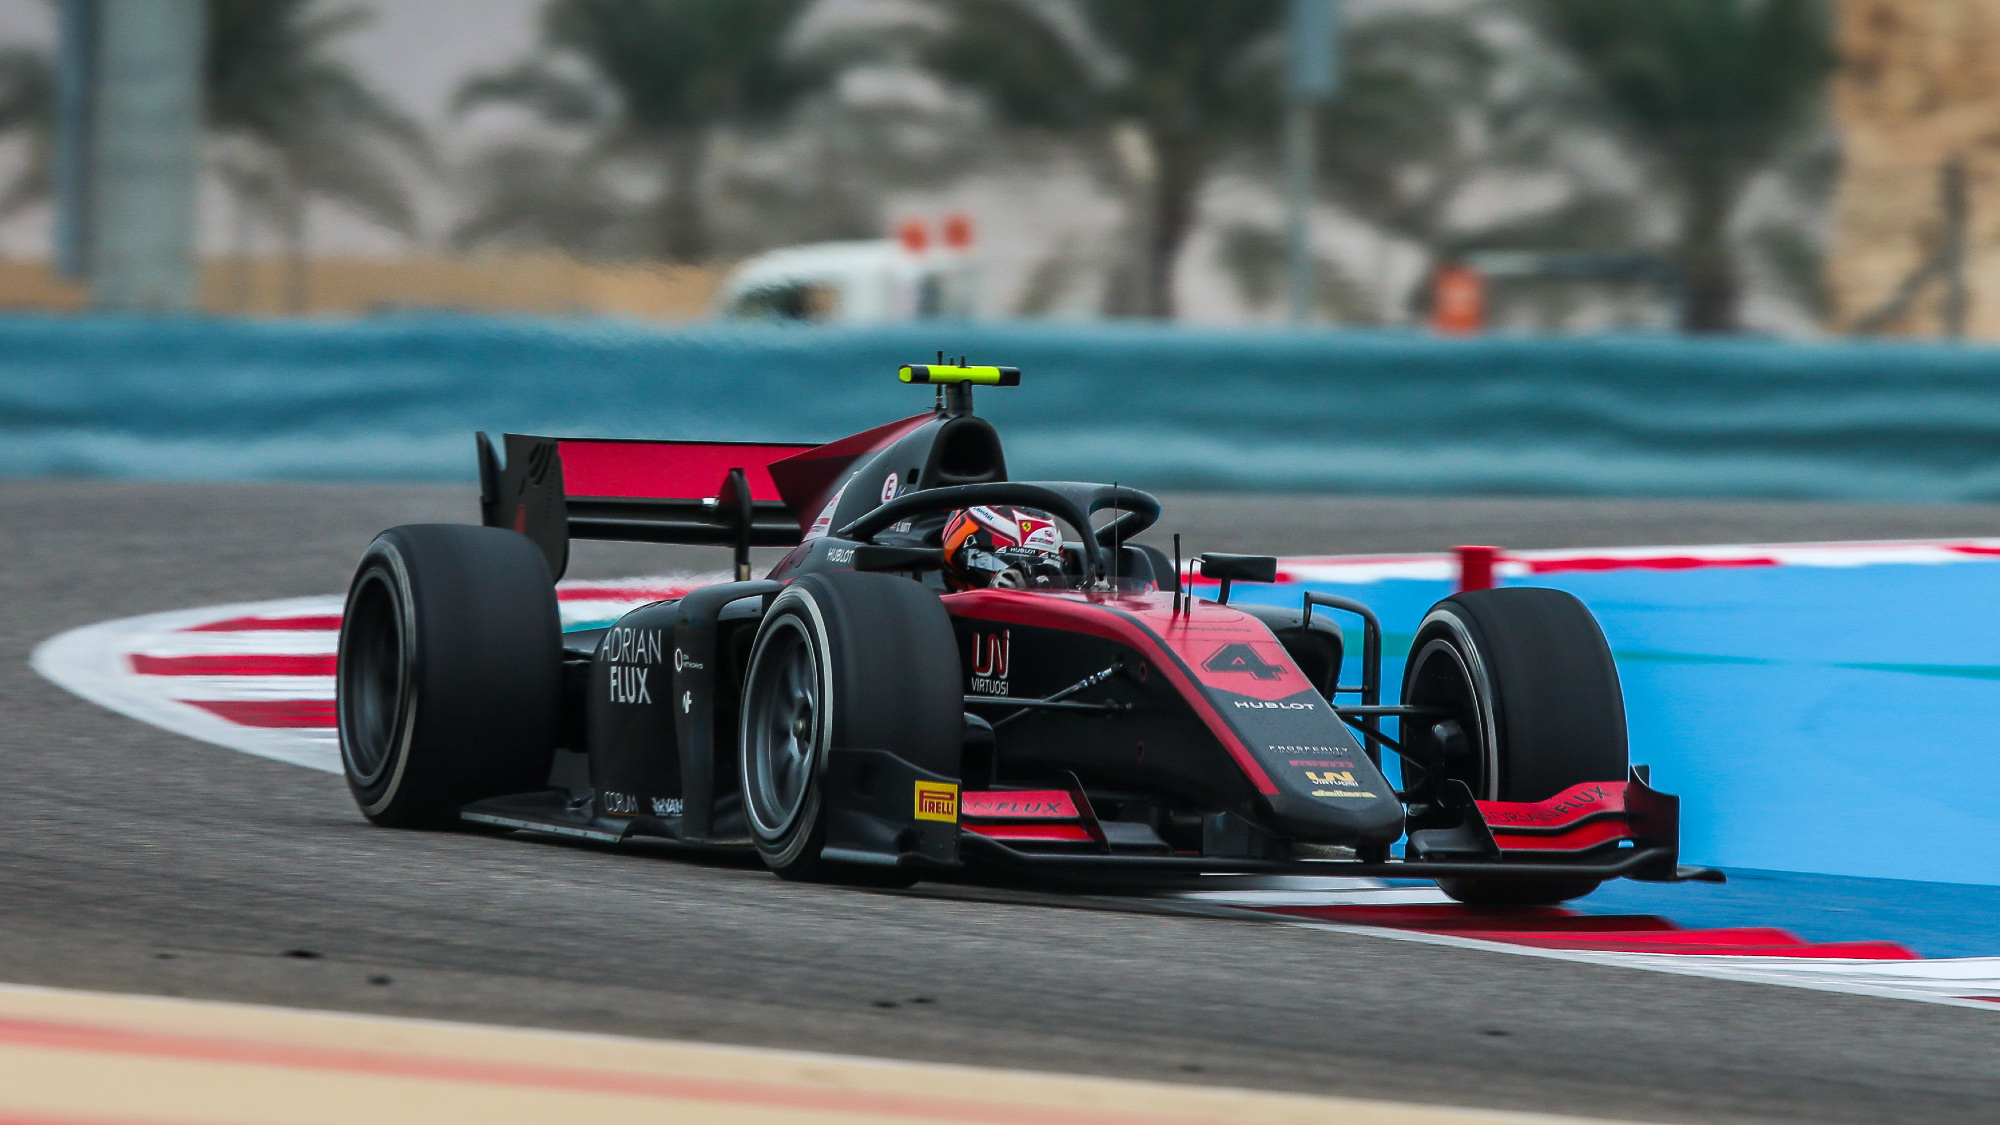 Callum Ilott, 2020 F2 Bahrain